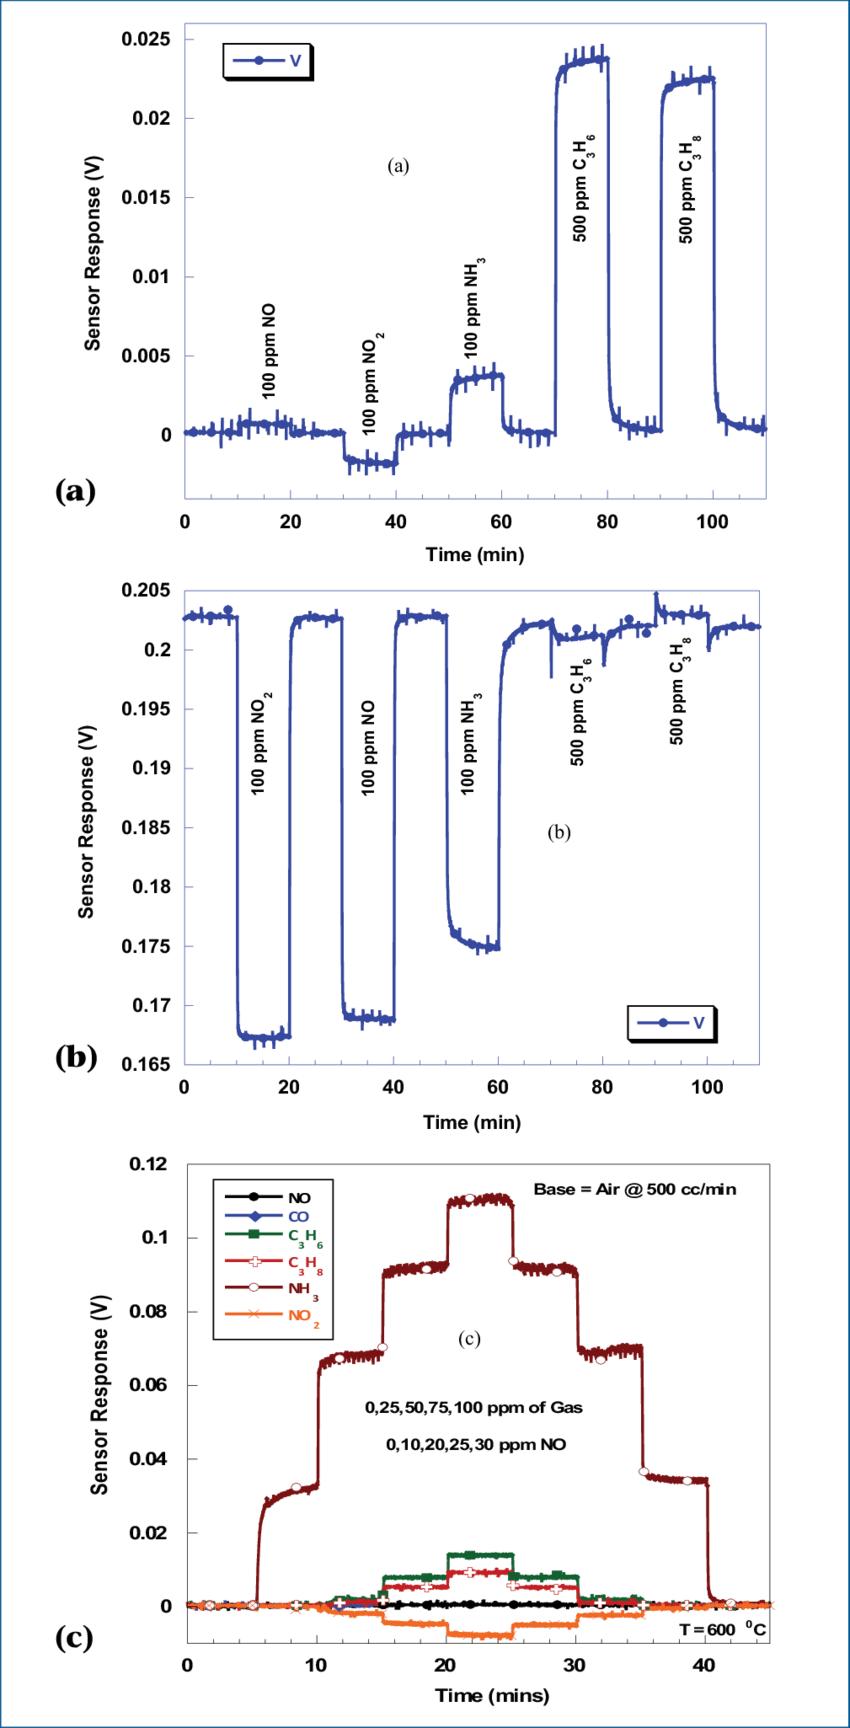 hight resolution of sensor configuration la 0 8 sr 0 2 cro 3 ysz pt open circuit 550 c 200 sccm b sensor configuration la 0 8 sr 0 2 cro 3 ysz pt